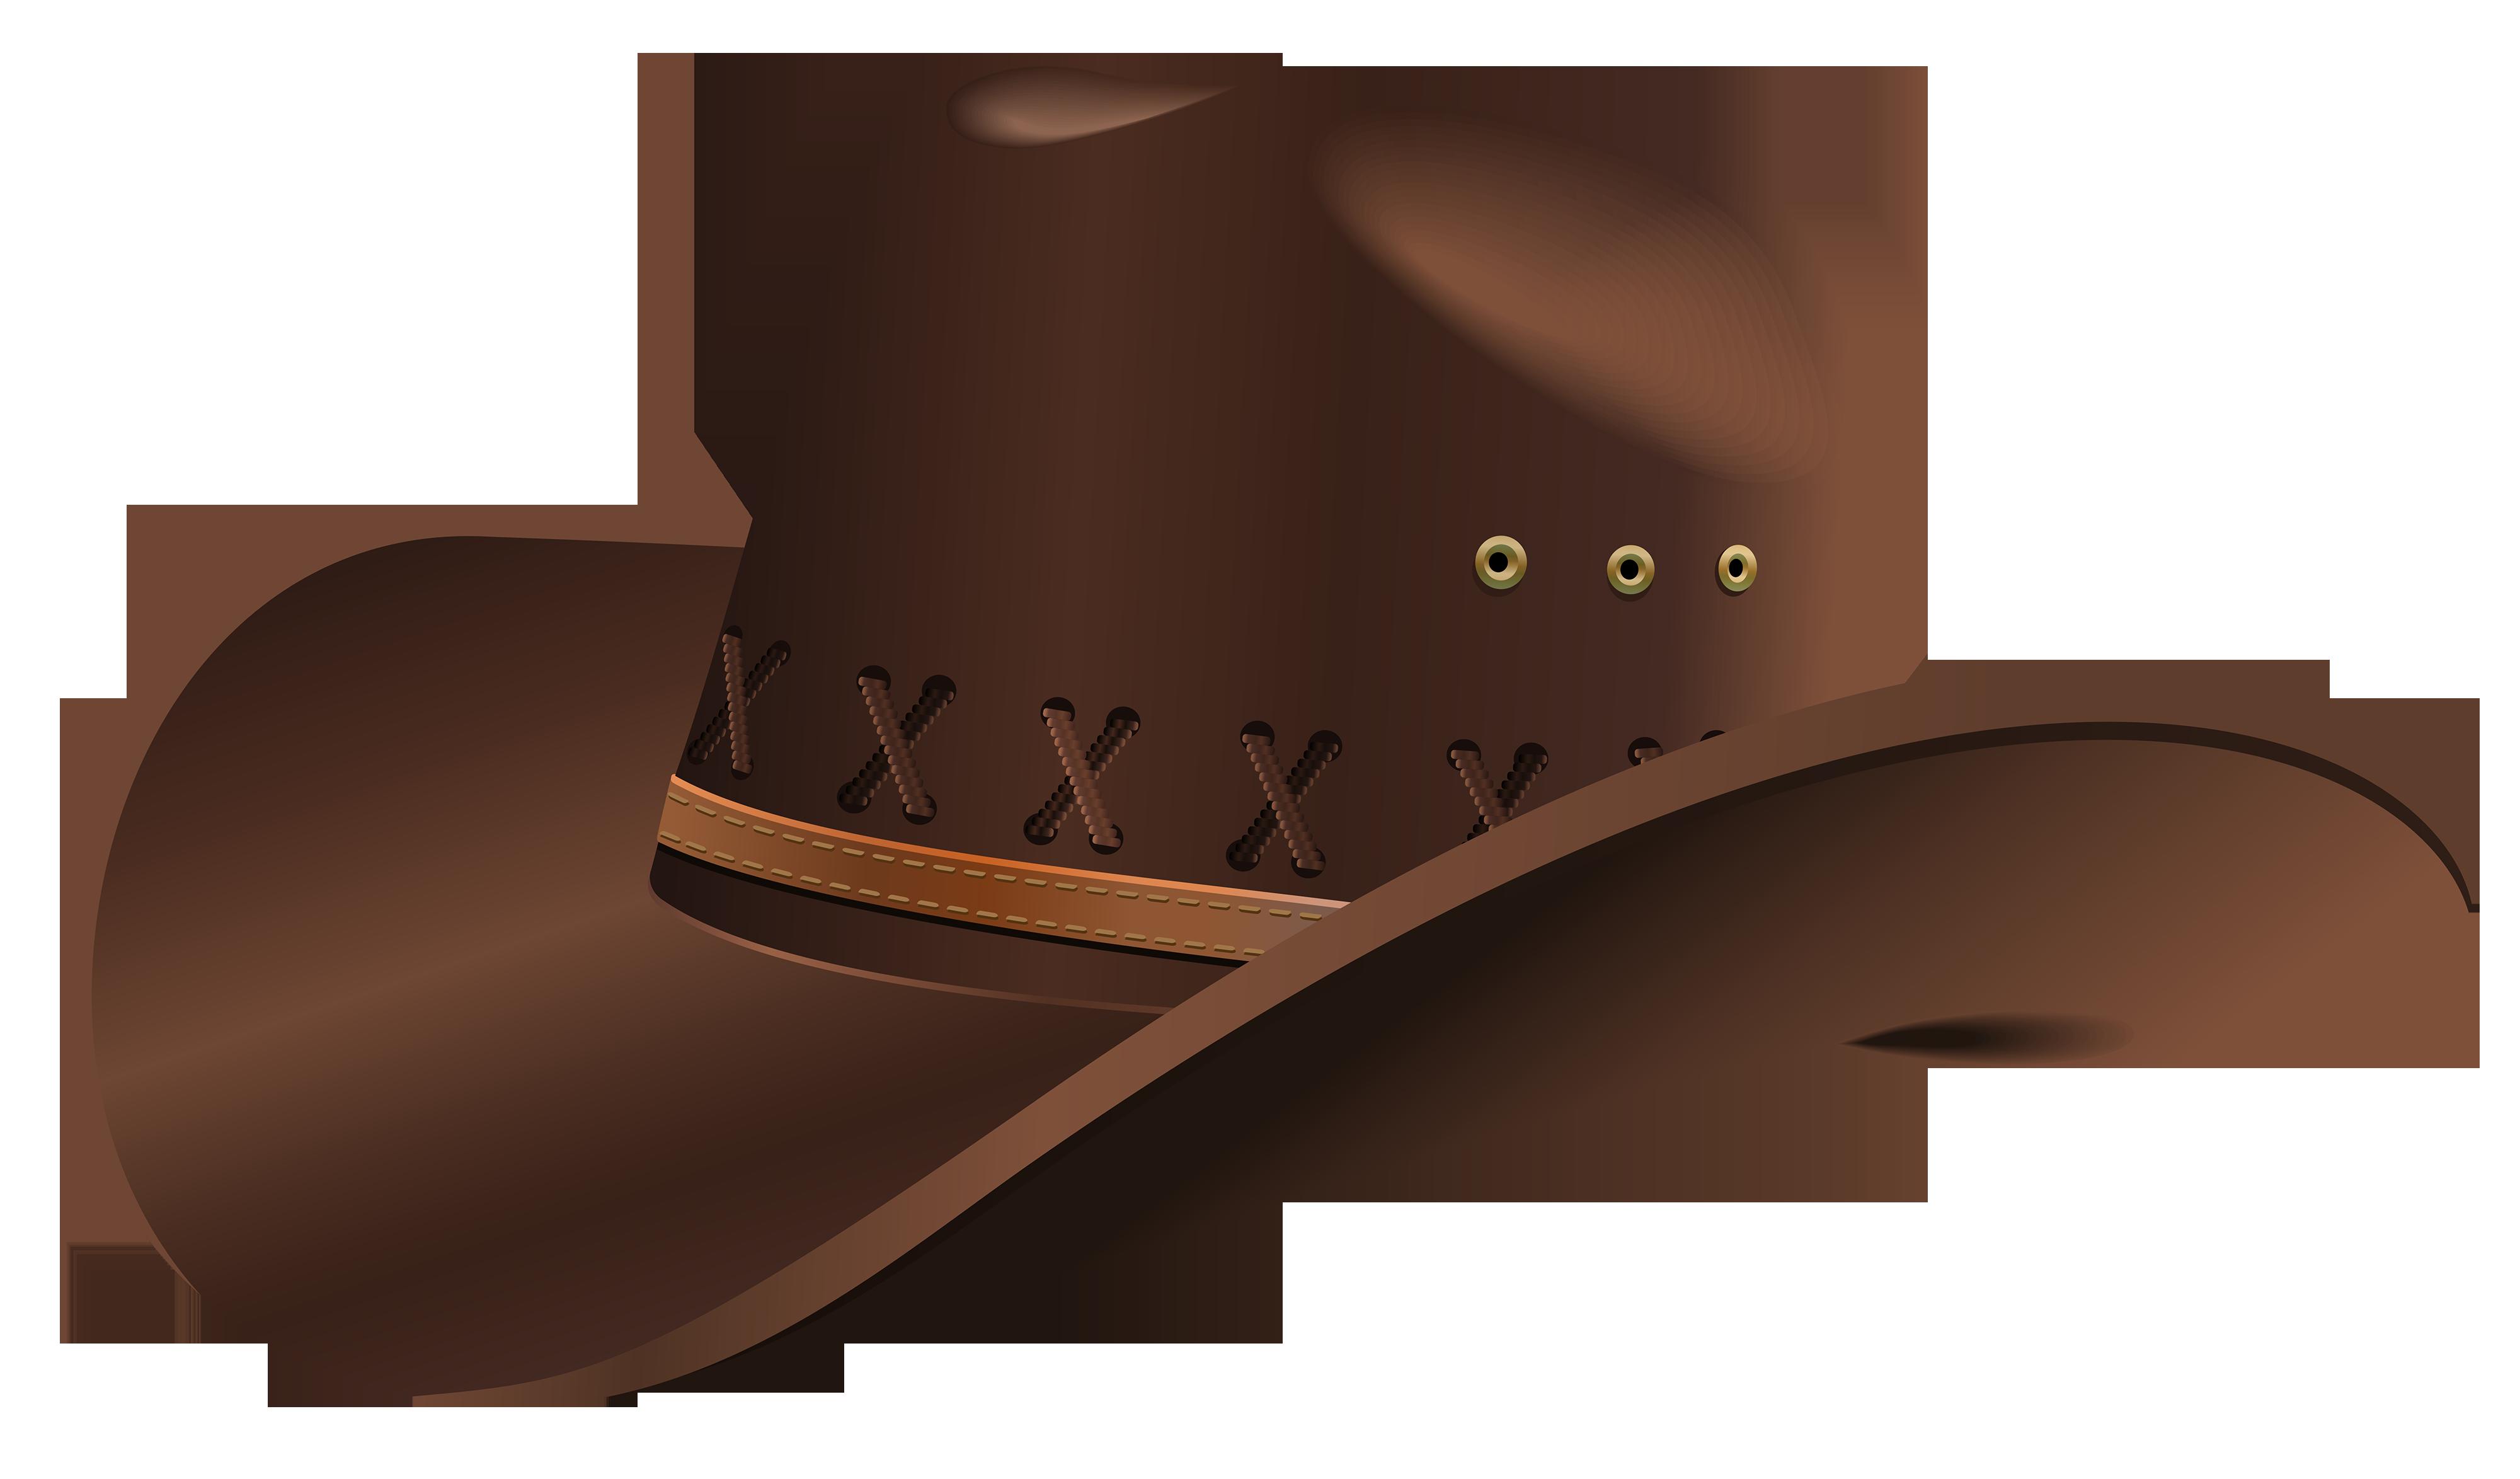 Cowboy hats clipart png royalty free Cowboy hat clip art image - Cliparting.com png royalty free